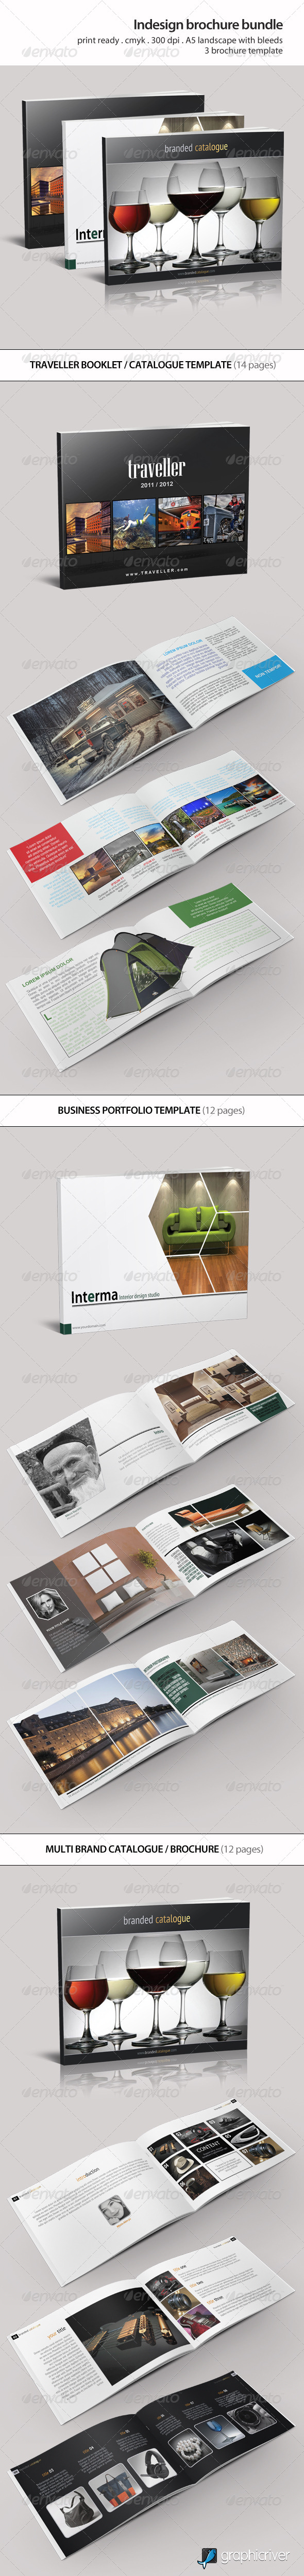 GraphicRiver Indesign Brochure Bundle Vol 1 5947218